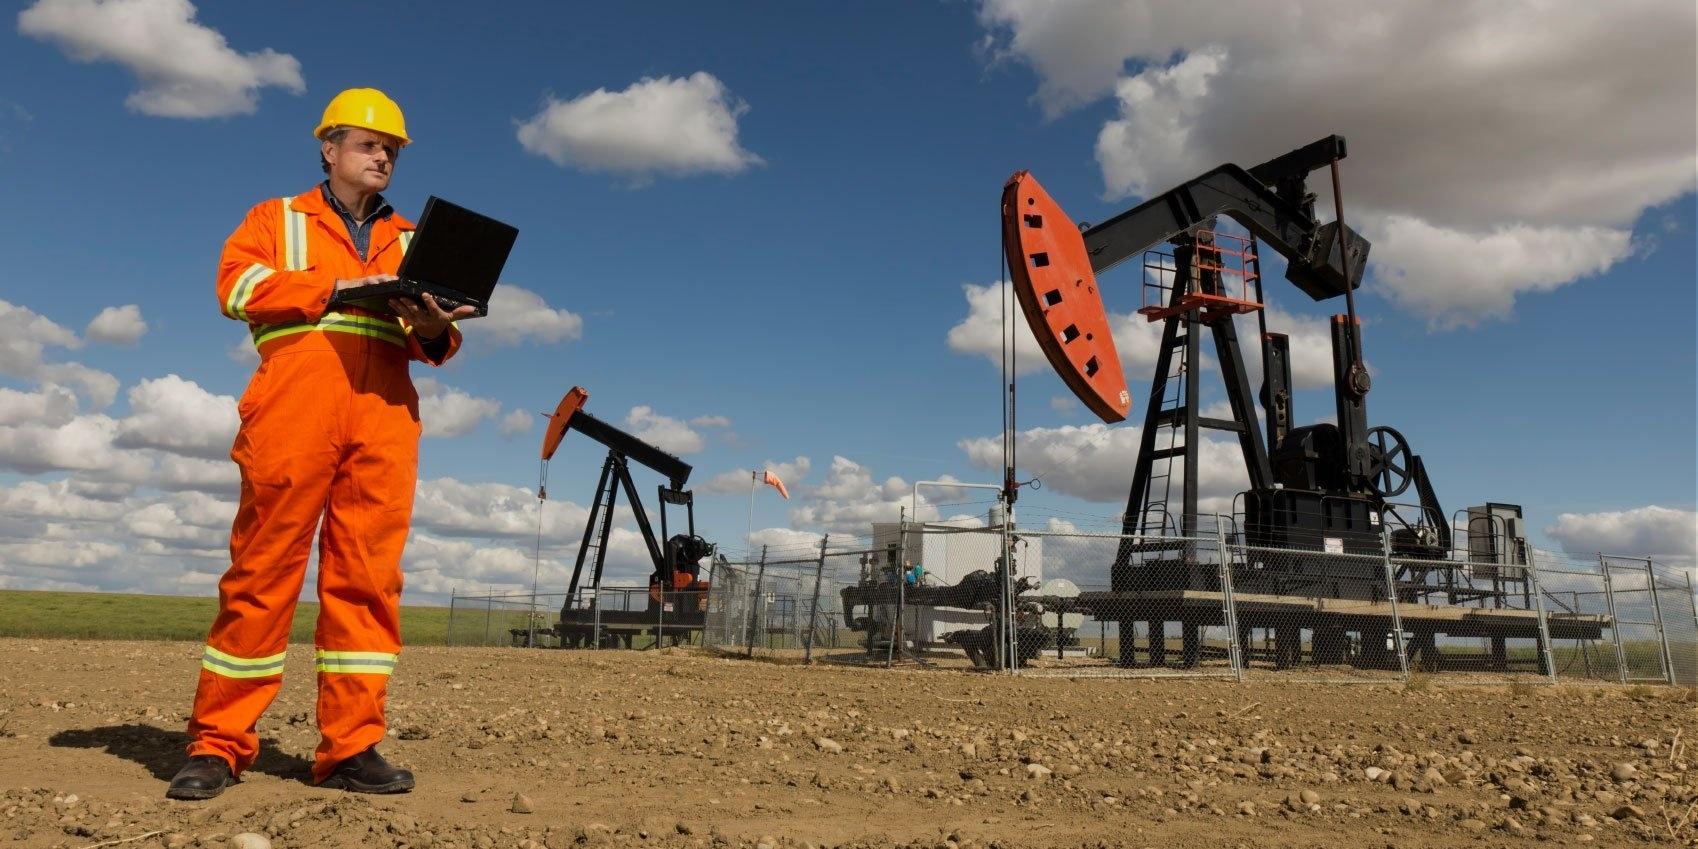 oilfield-automation-scada-1-430926-edited